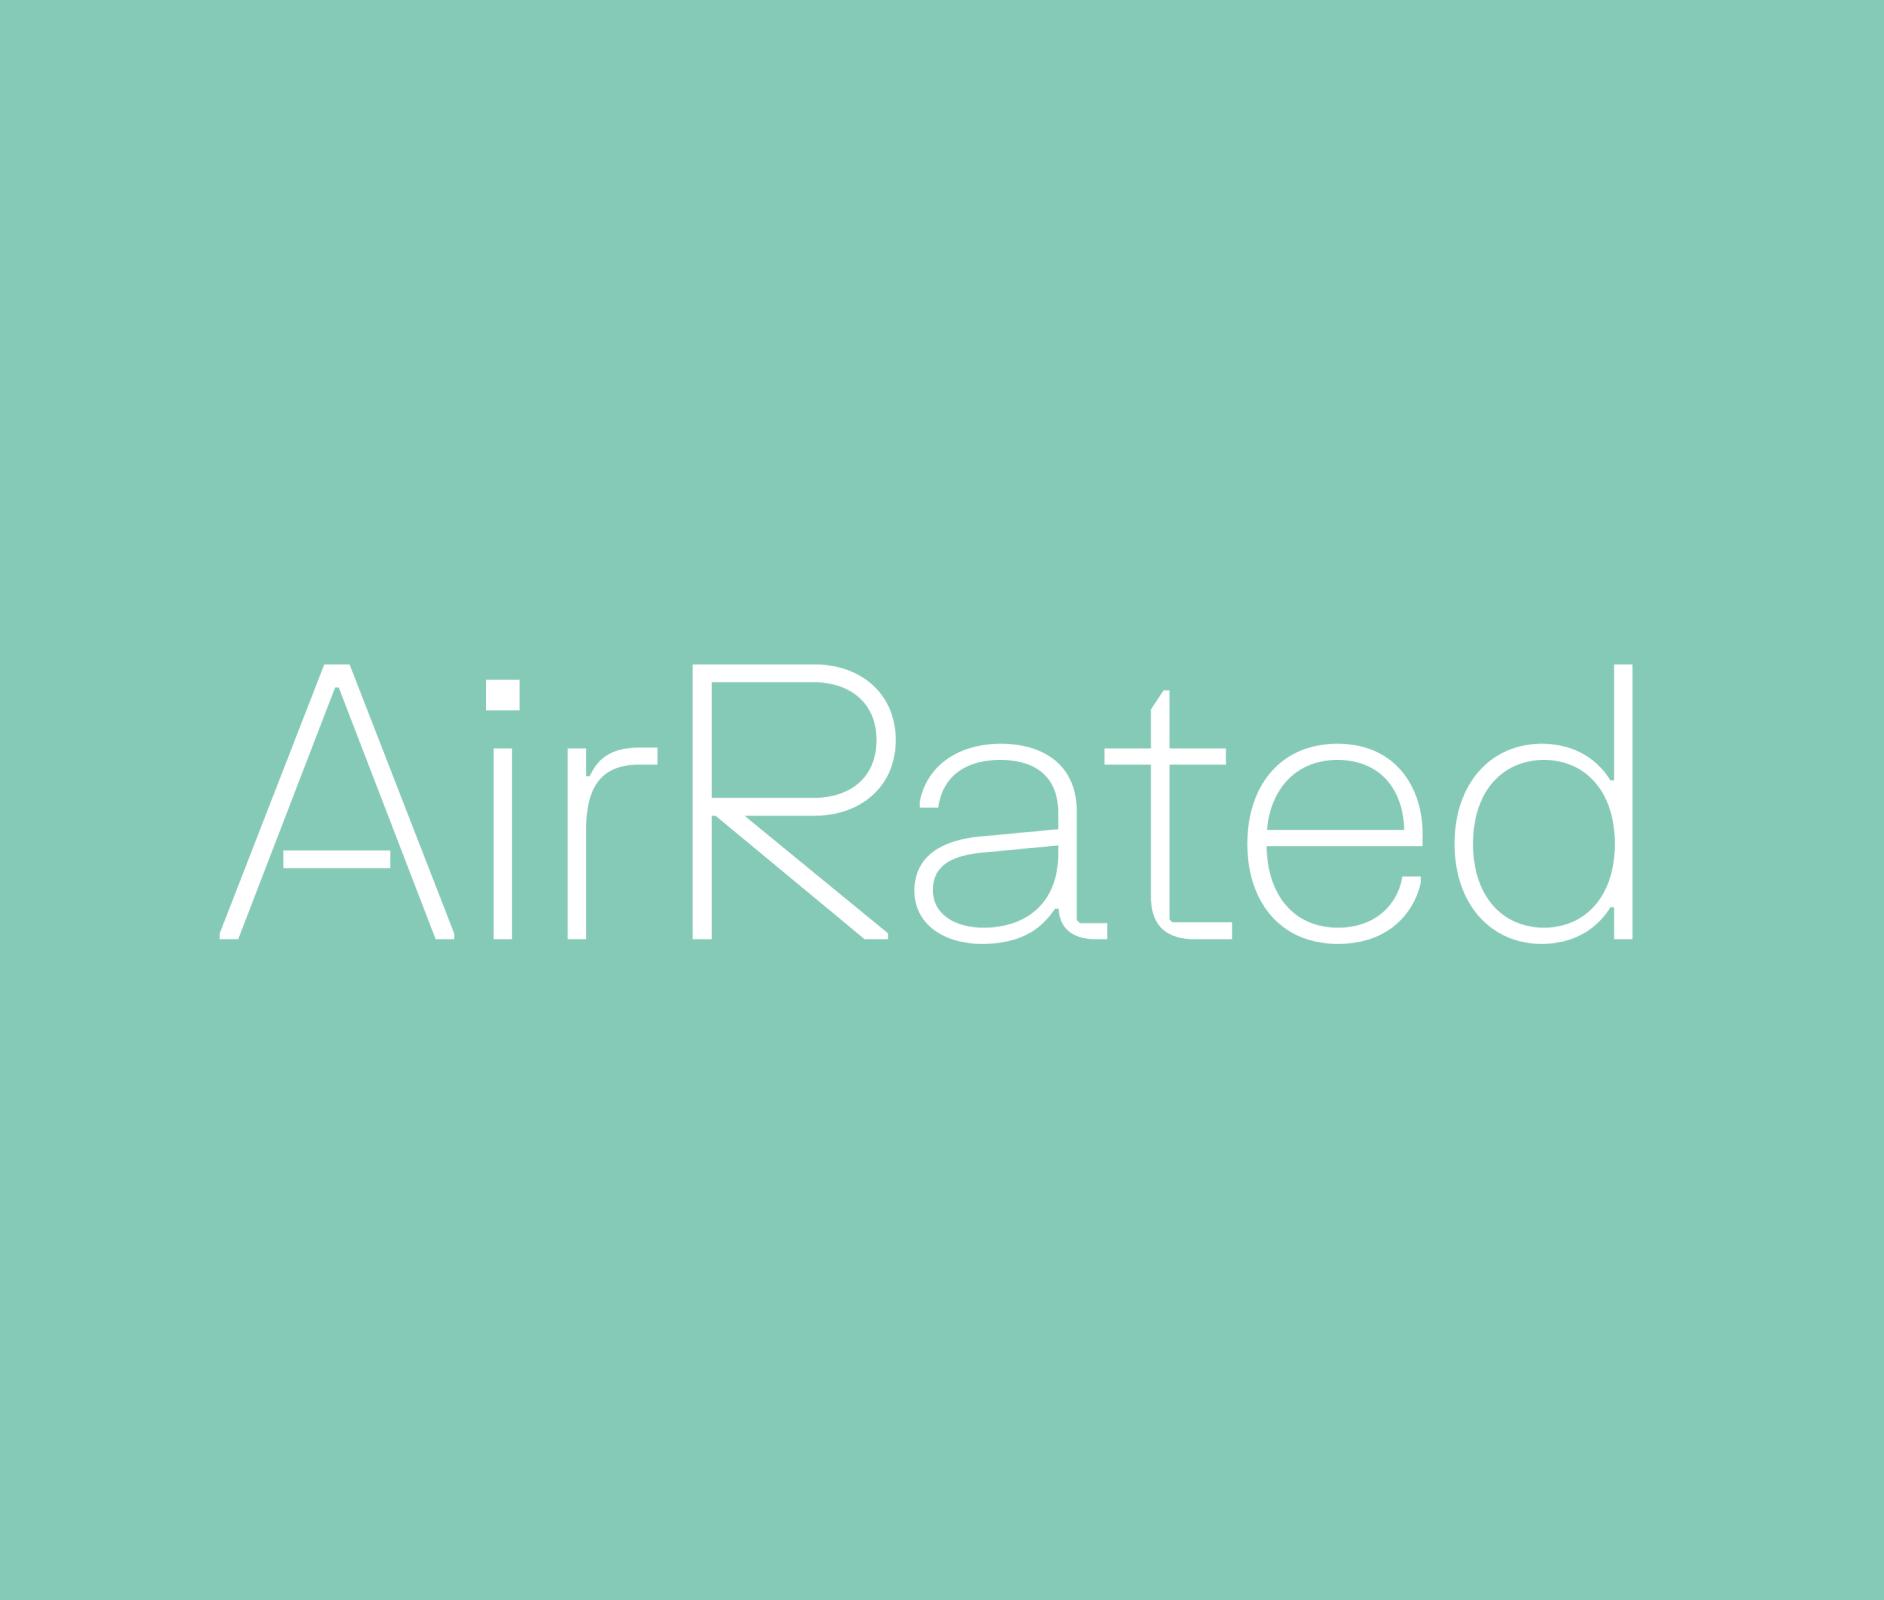 AirRated logo